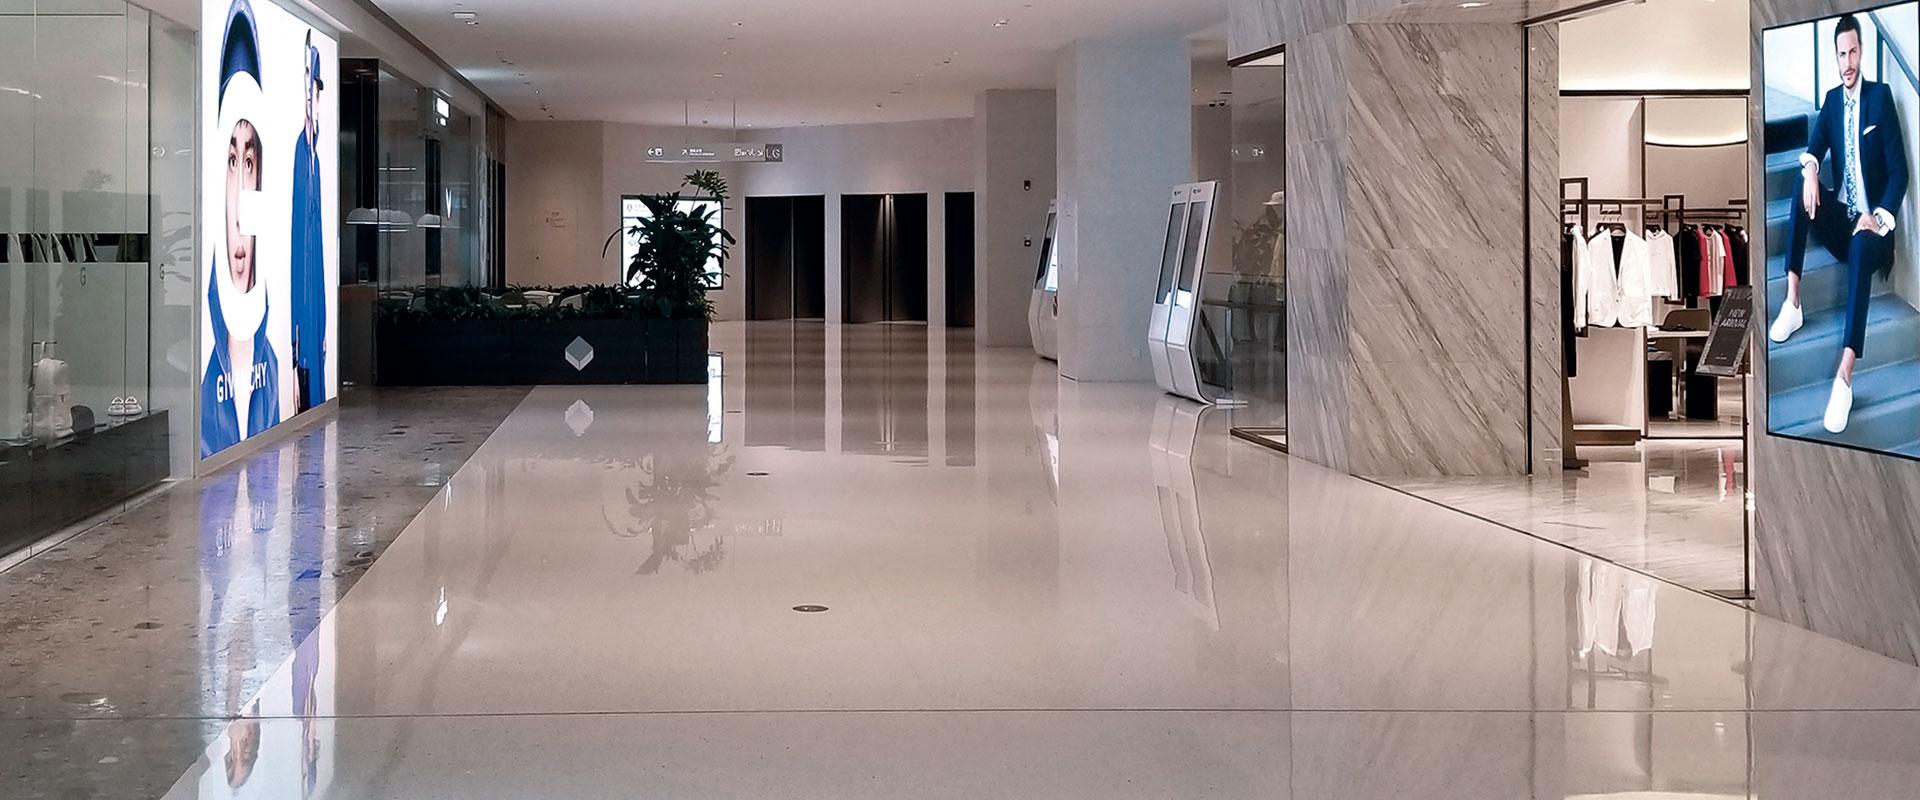 AGGLOTECH-progetto-mall-mixc-crcity-slider-2